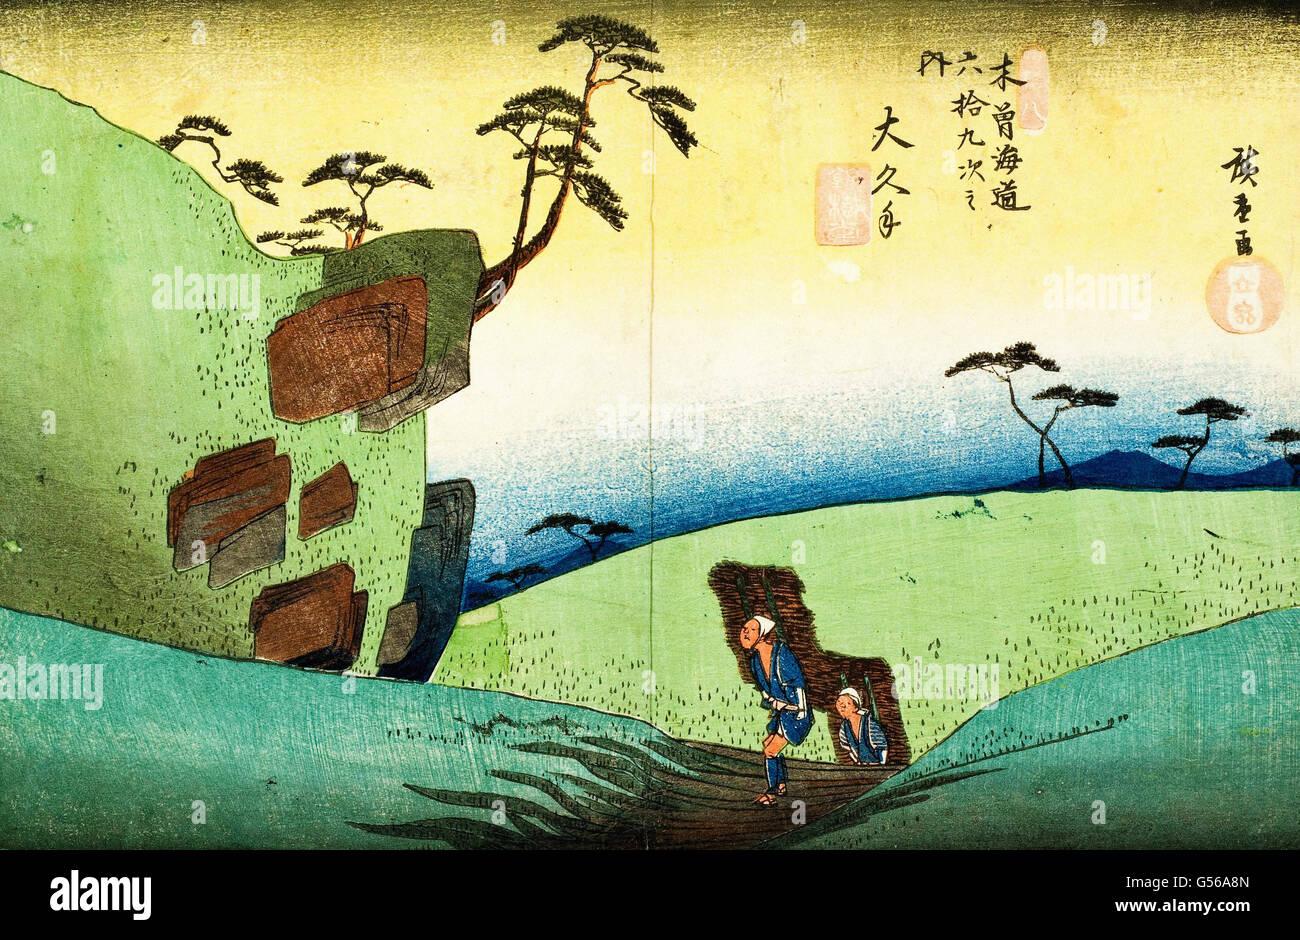 Utagawa Hiroshige - Xilogravura Imagens de Stock